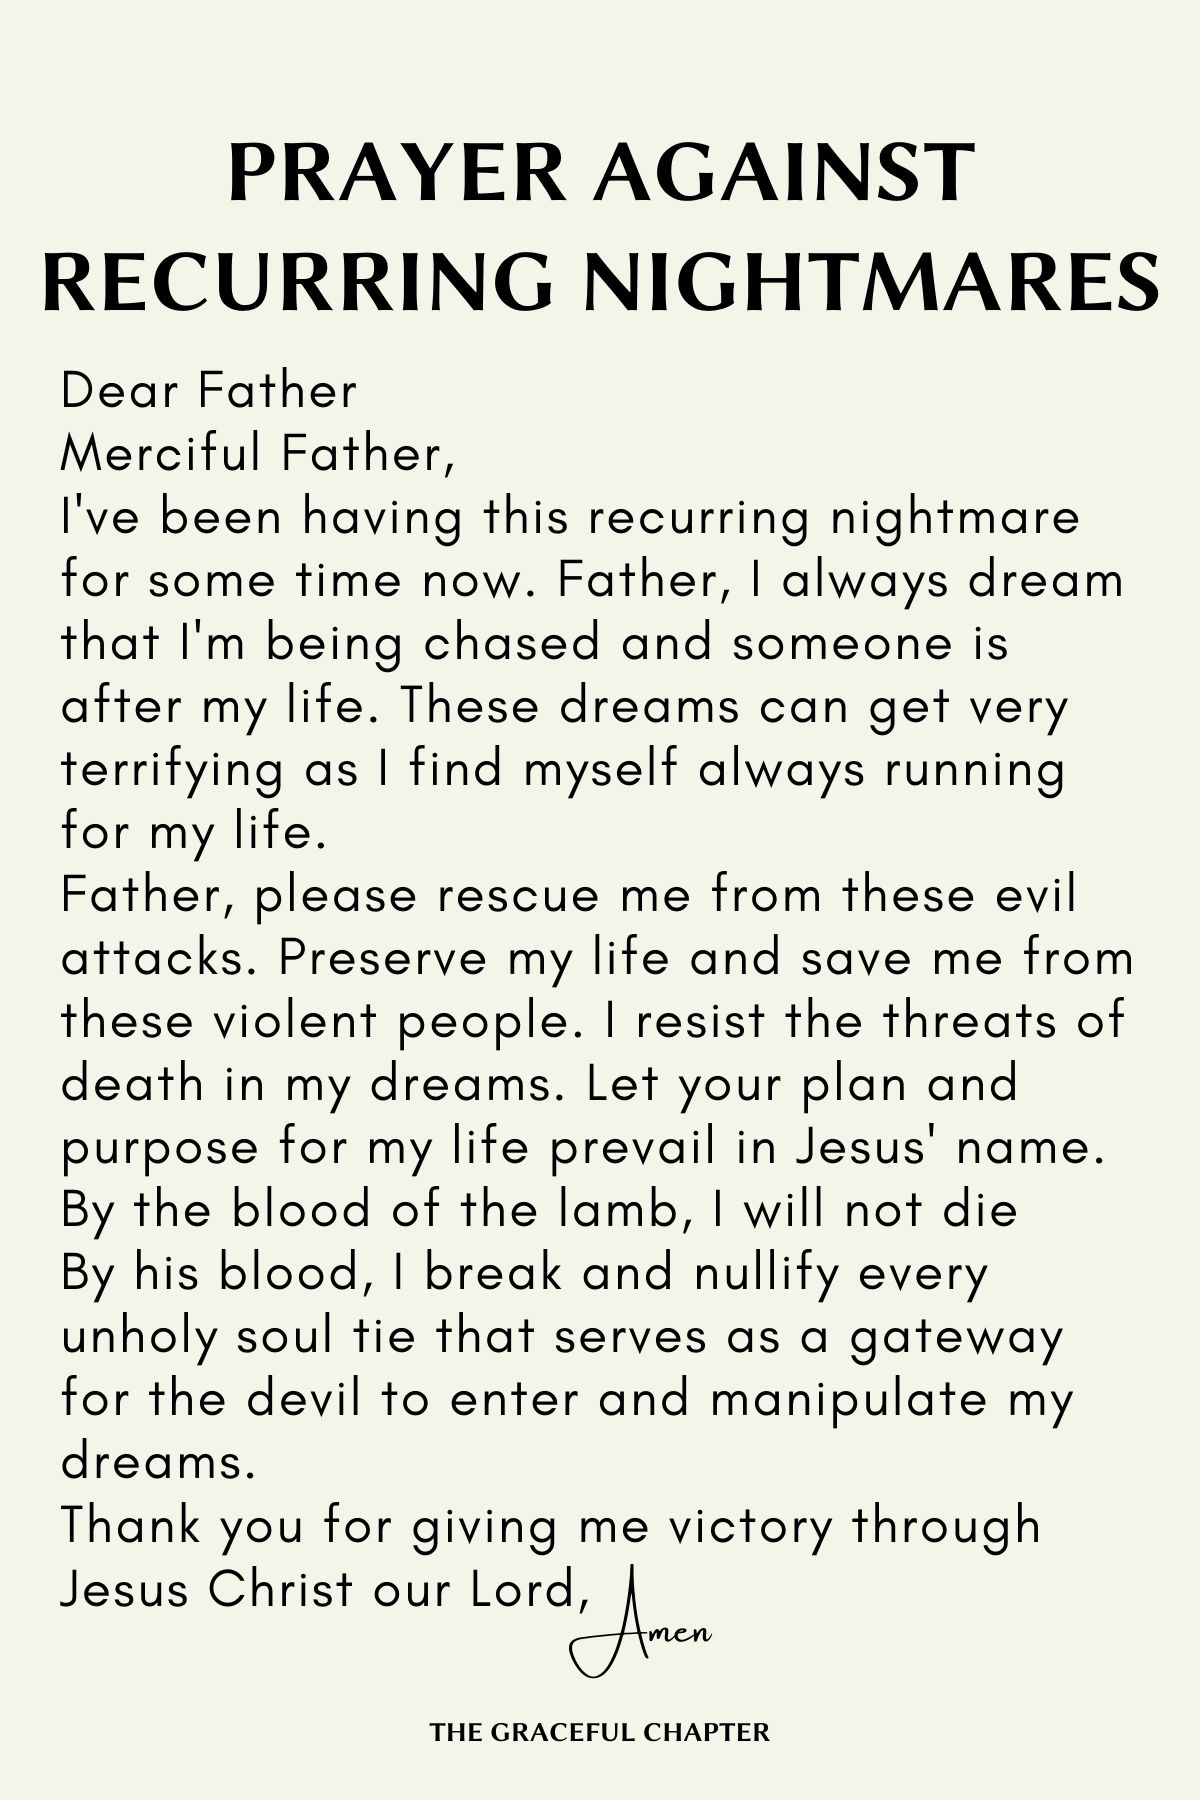 Prayer against recurring nightmares